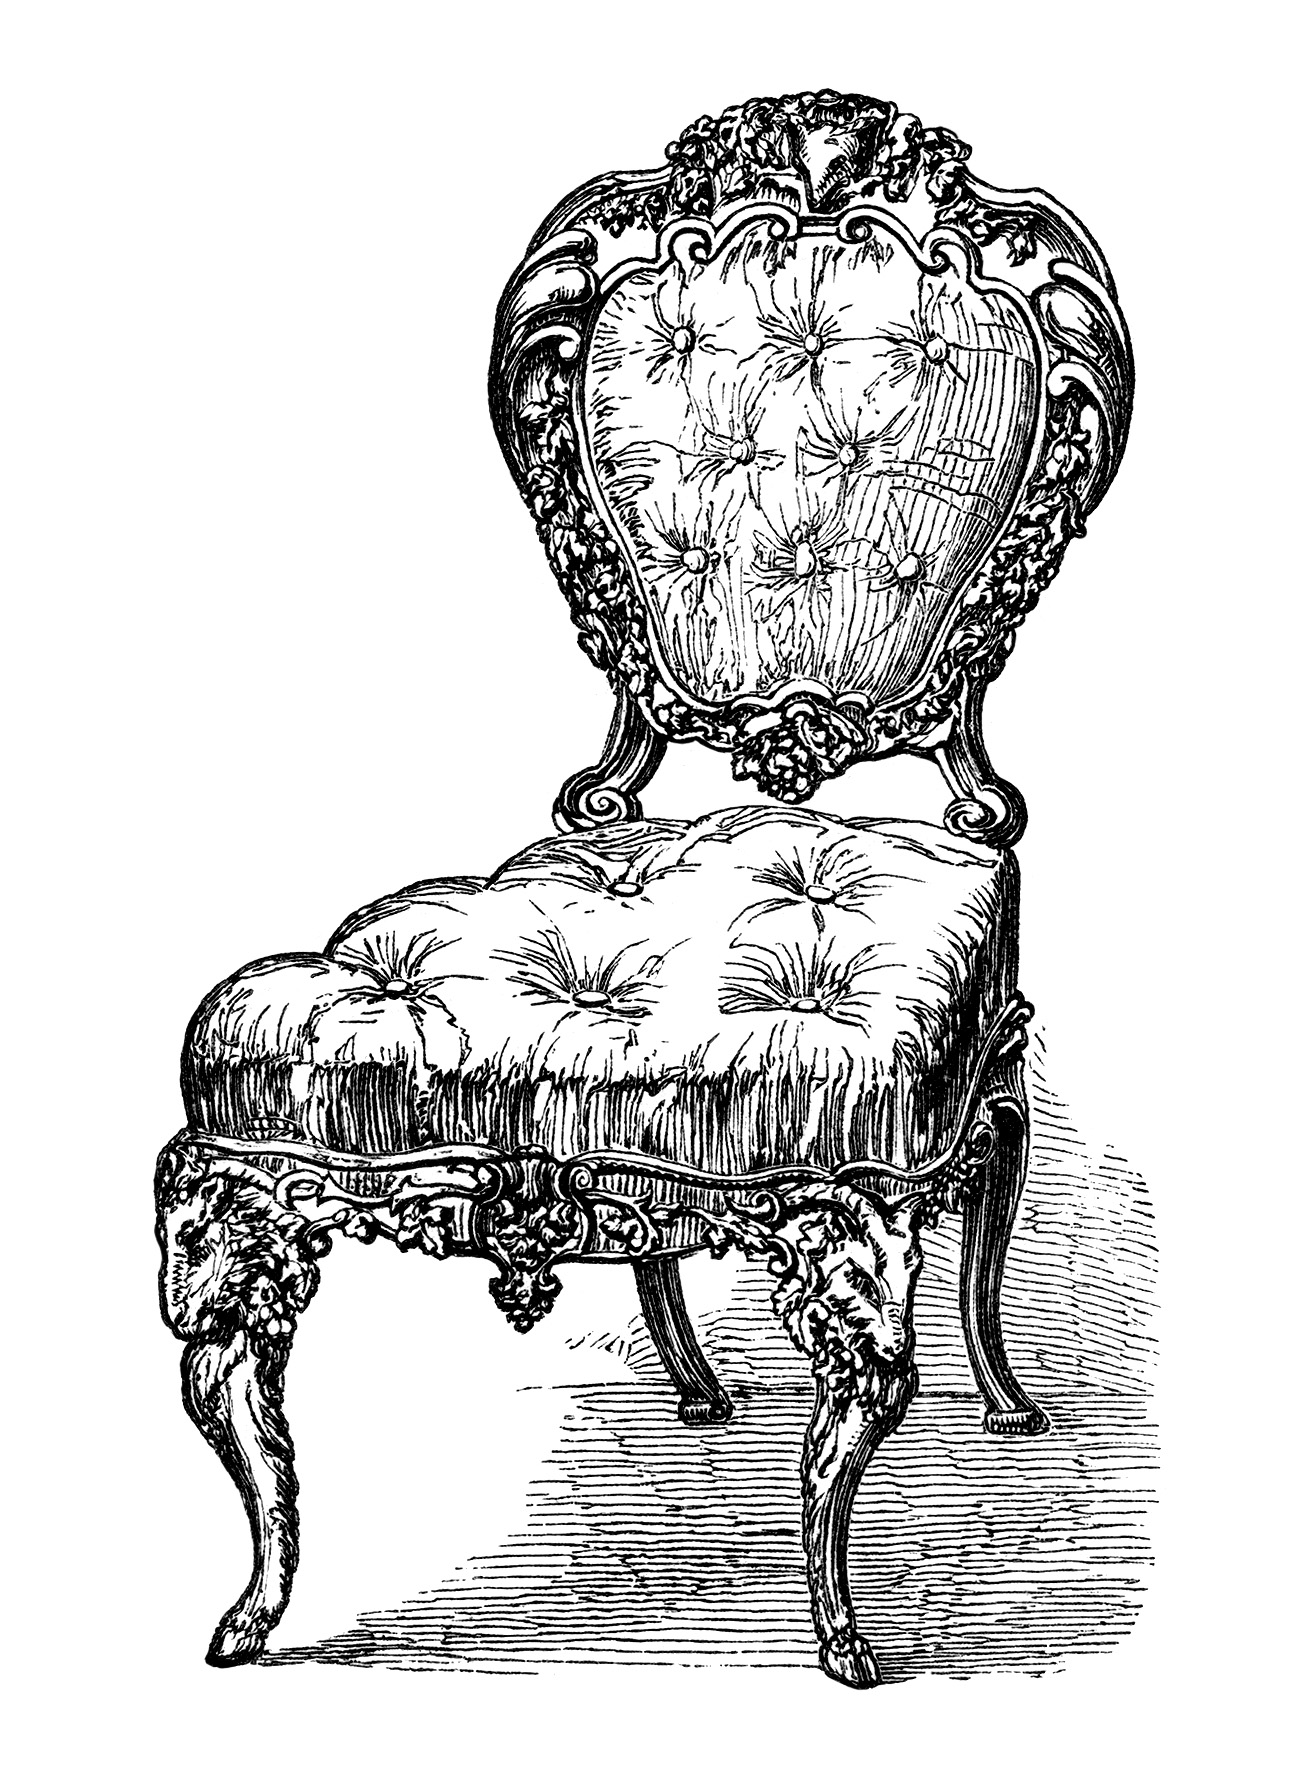 Chair clipart antique, Chair antique Transparent FREE for.